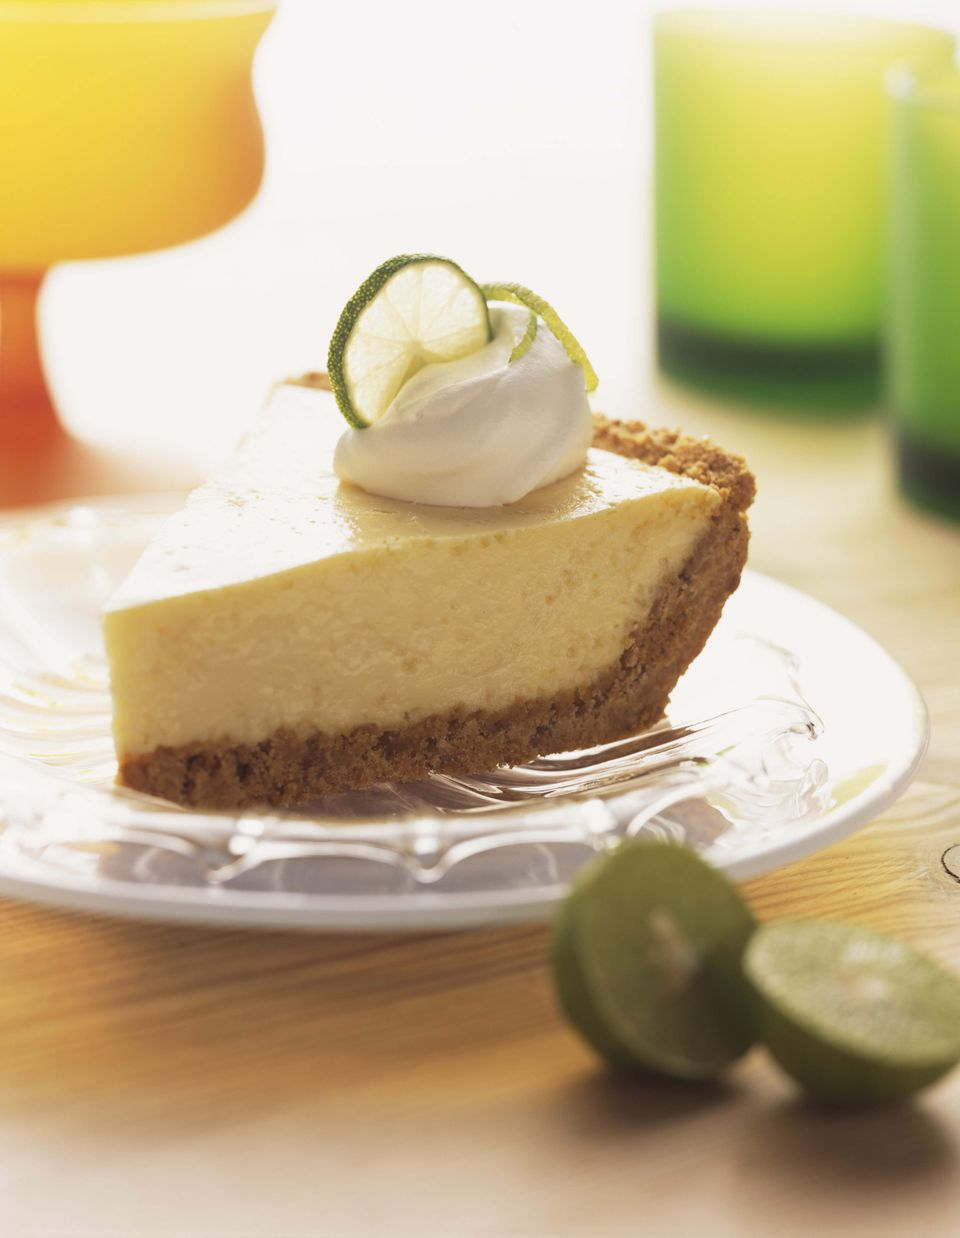 Receta de pastel de látigo fresco con gelatina de lima